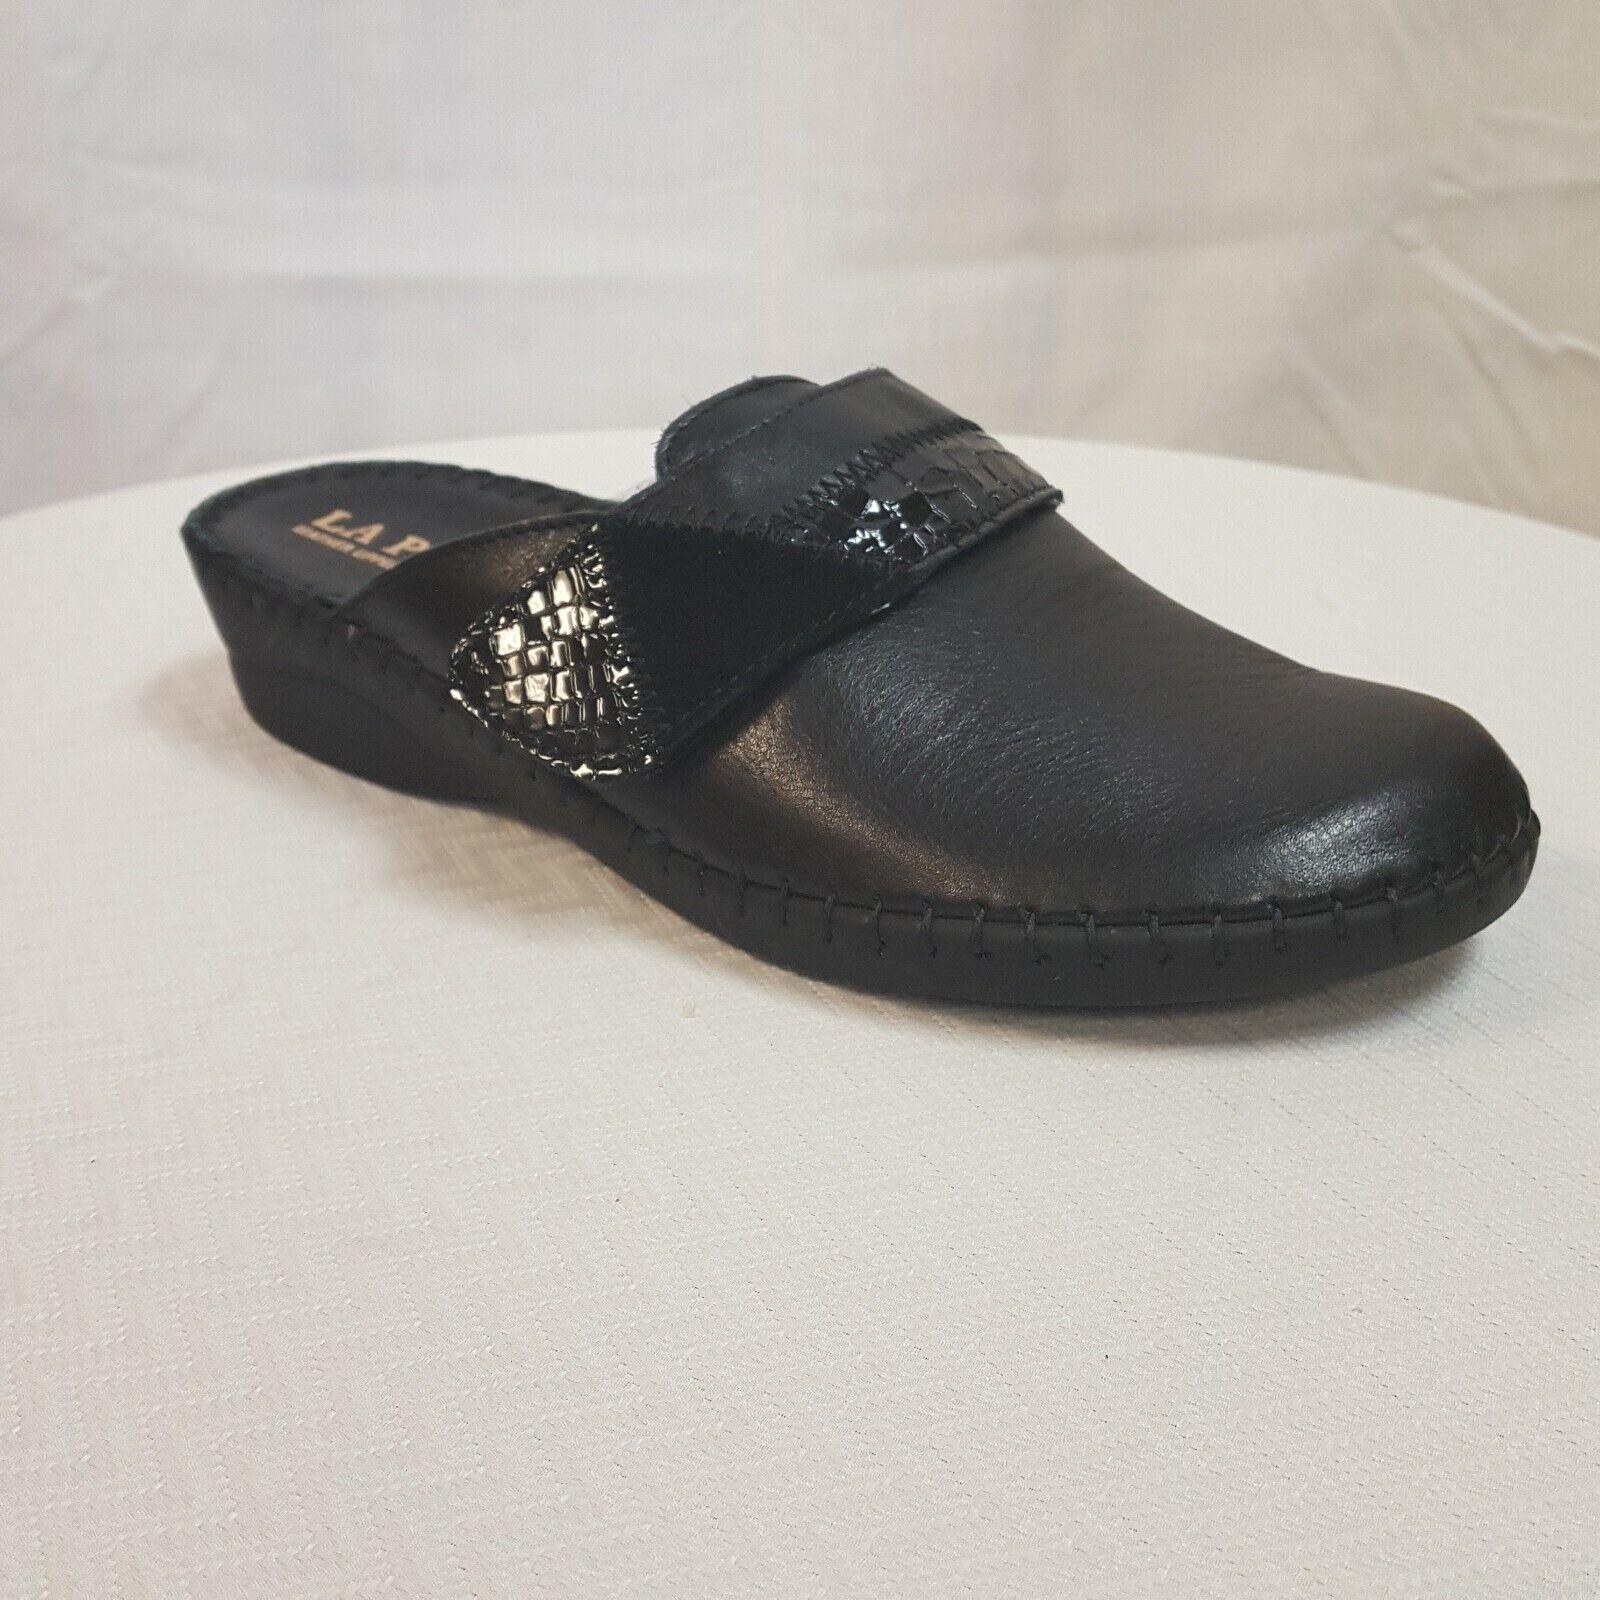 La Plume Santori Women's Black Soft Leather comfort Mule EU 40 US 9